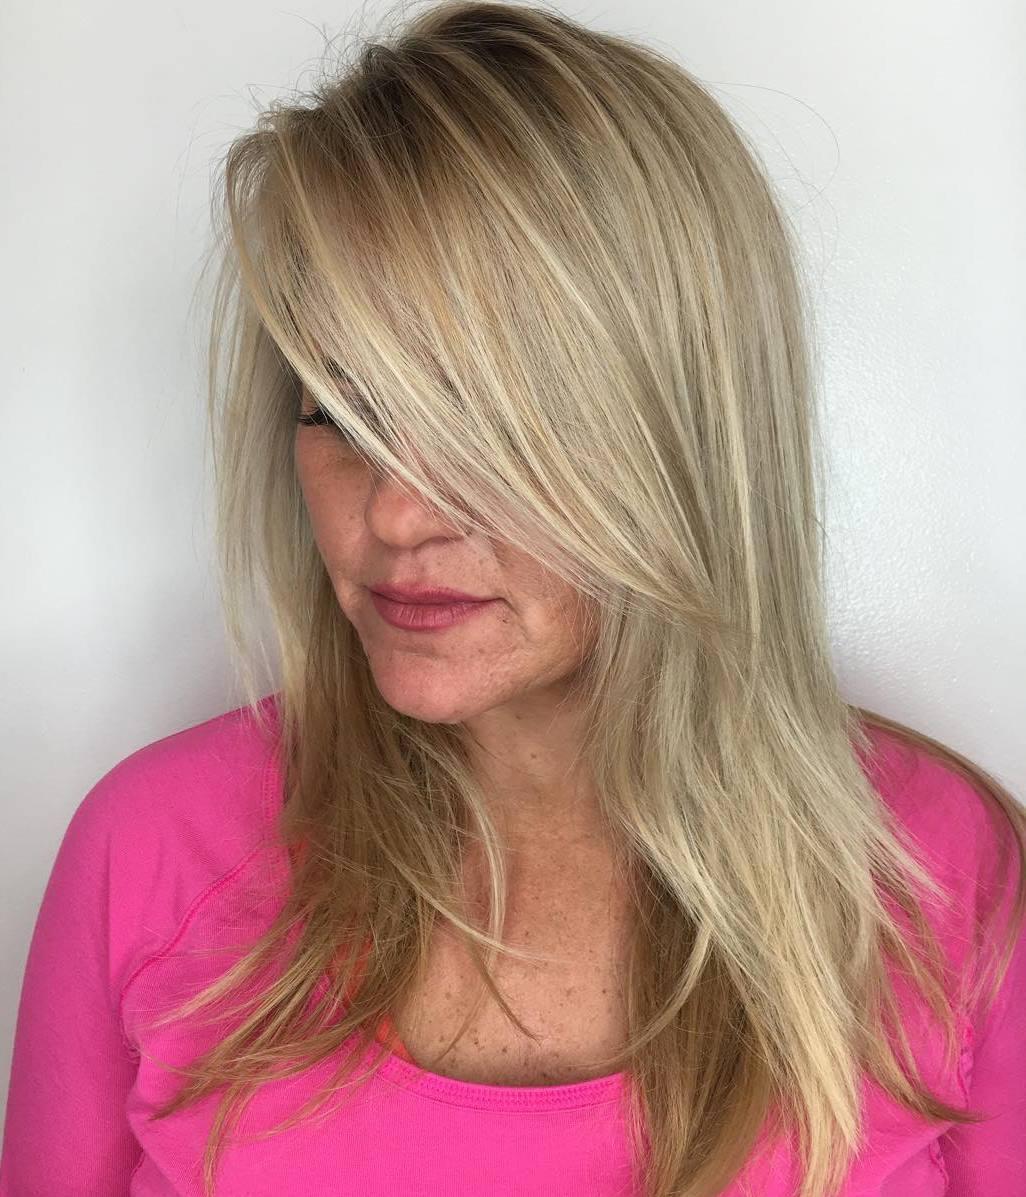 Fabulous 65 Devastatingly Cool Haircuts For Thin Hair Short Hairstyles Gunalazisus